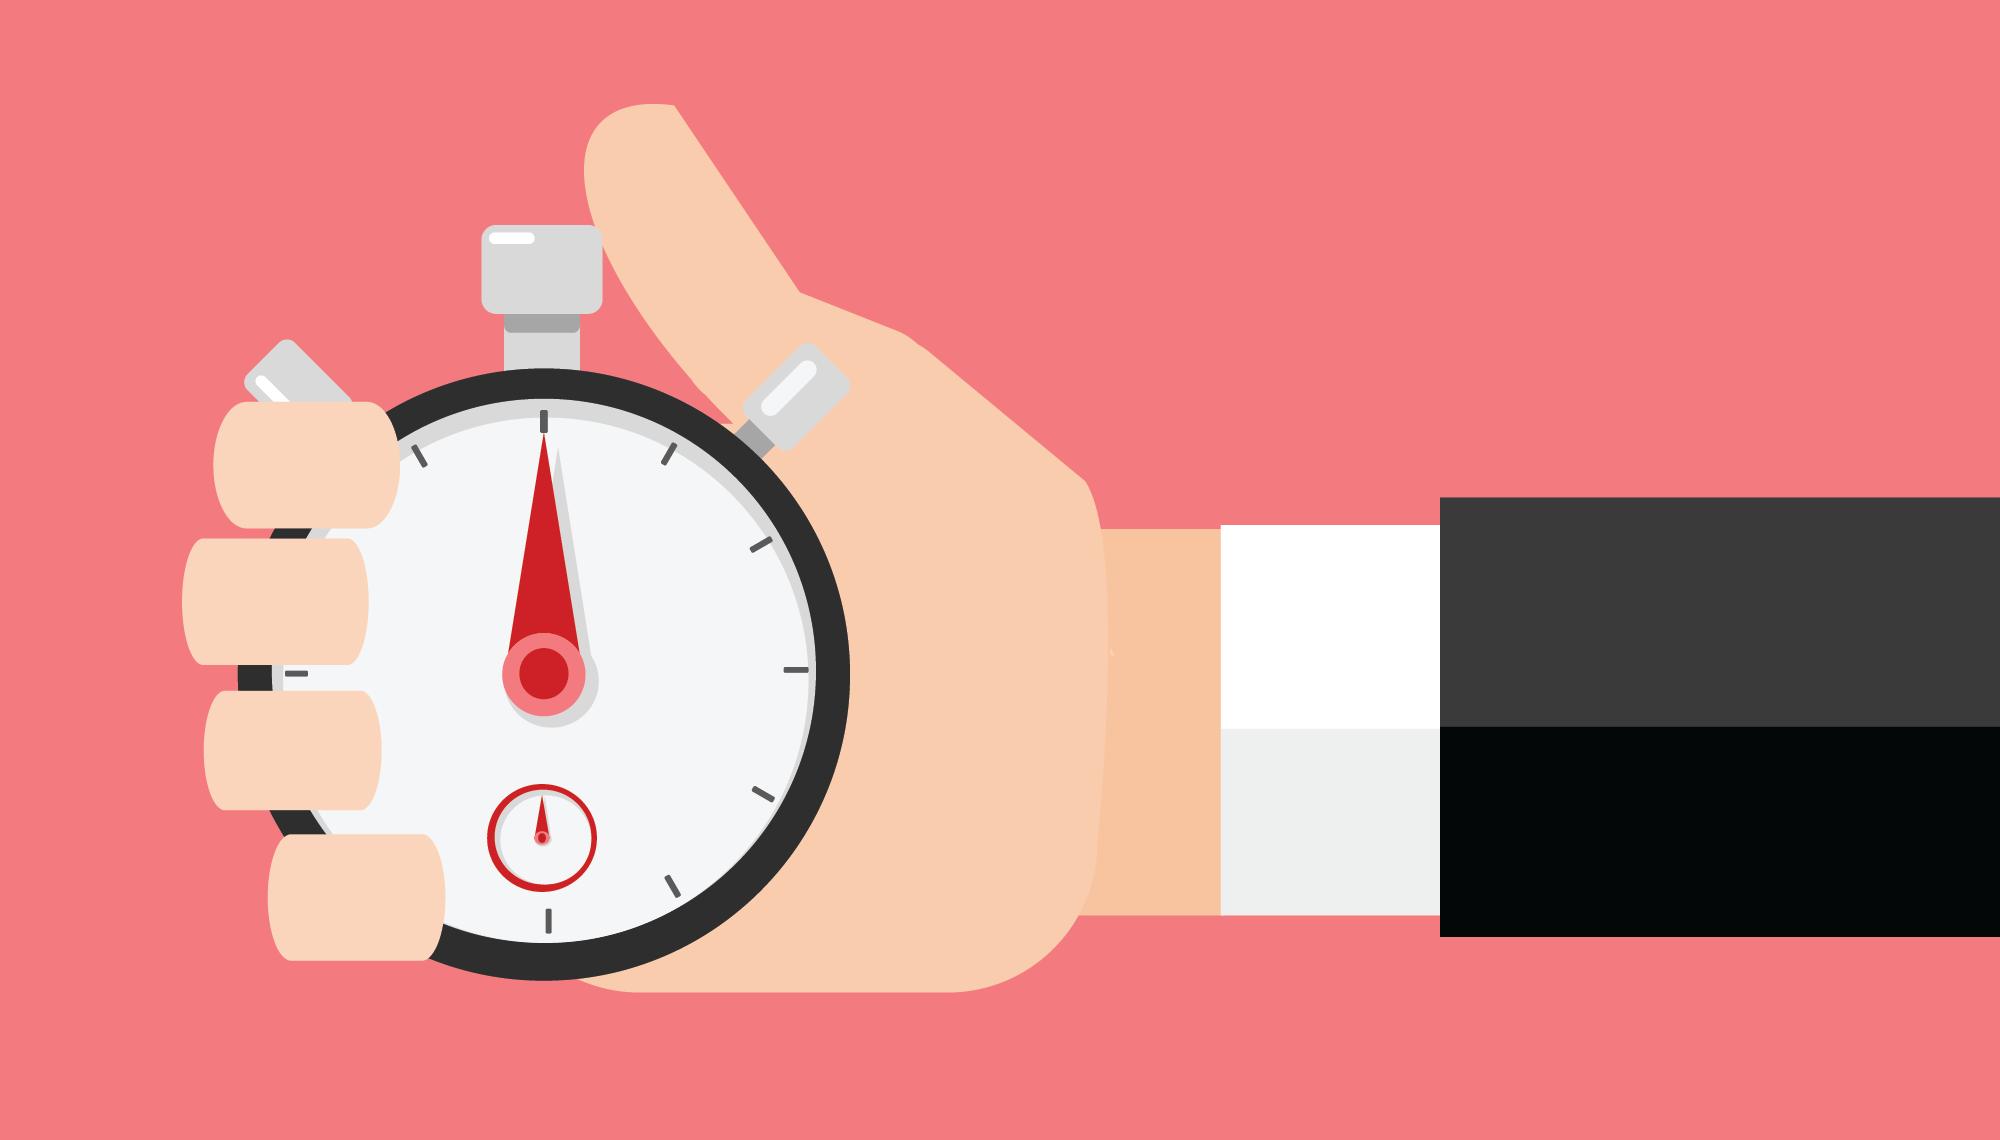 rep-ted-lieu-illegitimacy-clock-progressaapi